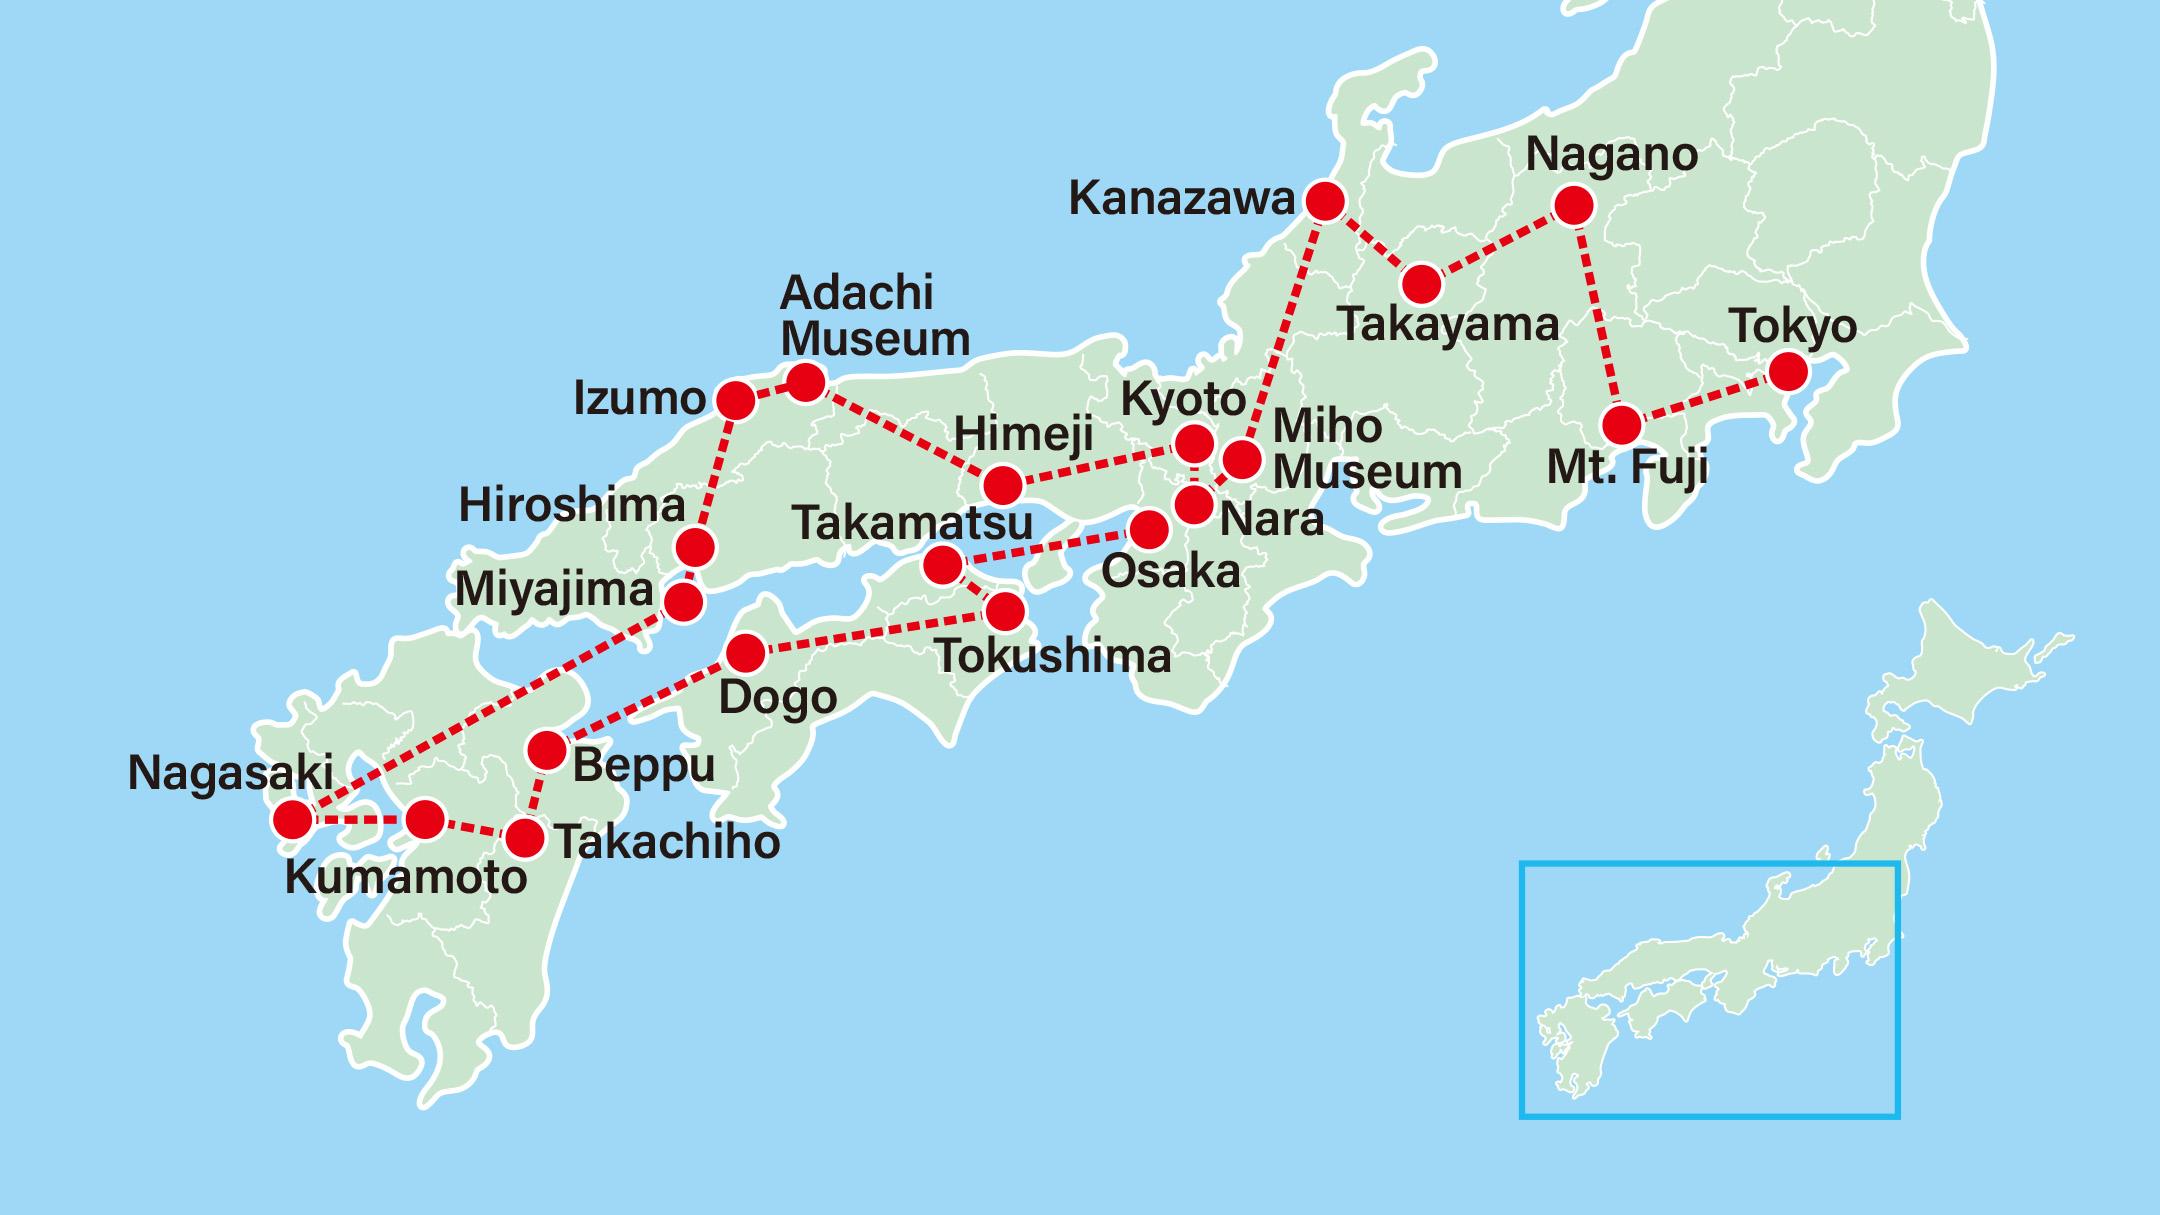 Grand Takayama Spring Festival 14 Days-Tokyo-Lake Kawaguchi-Nagano-Takayama-Kanazawa-Miho Museum-Nara-Kyoto-Himeji-Adachi Museum-Hiroshima-Miyajima-Nagasaki-Kumamoto-Takachiho-Beppu-Dogo-Ritsurin Garden-Tokushima-Osaka